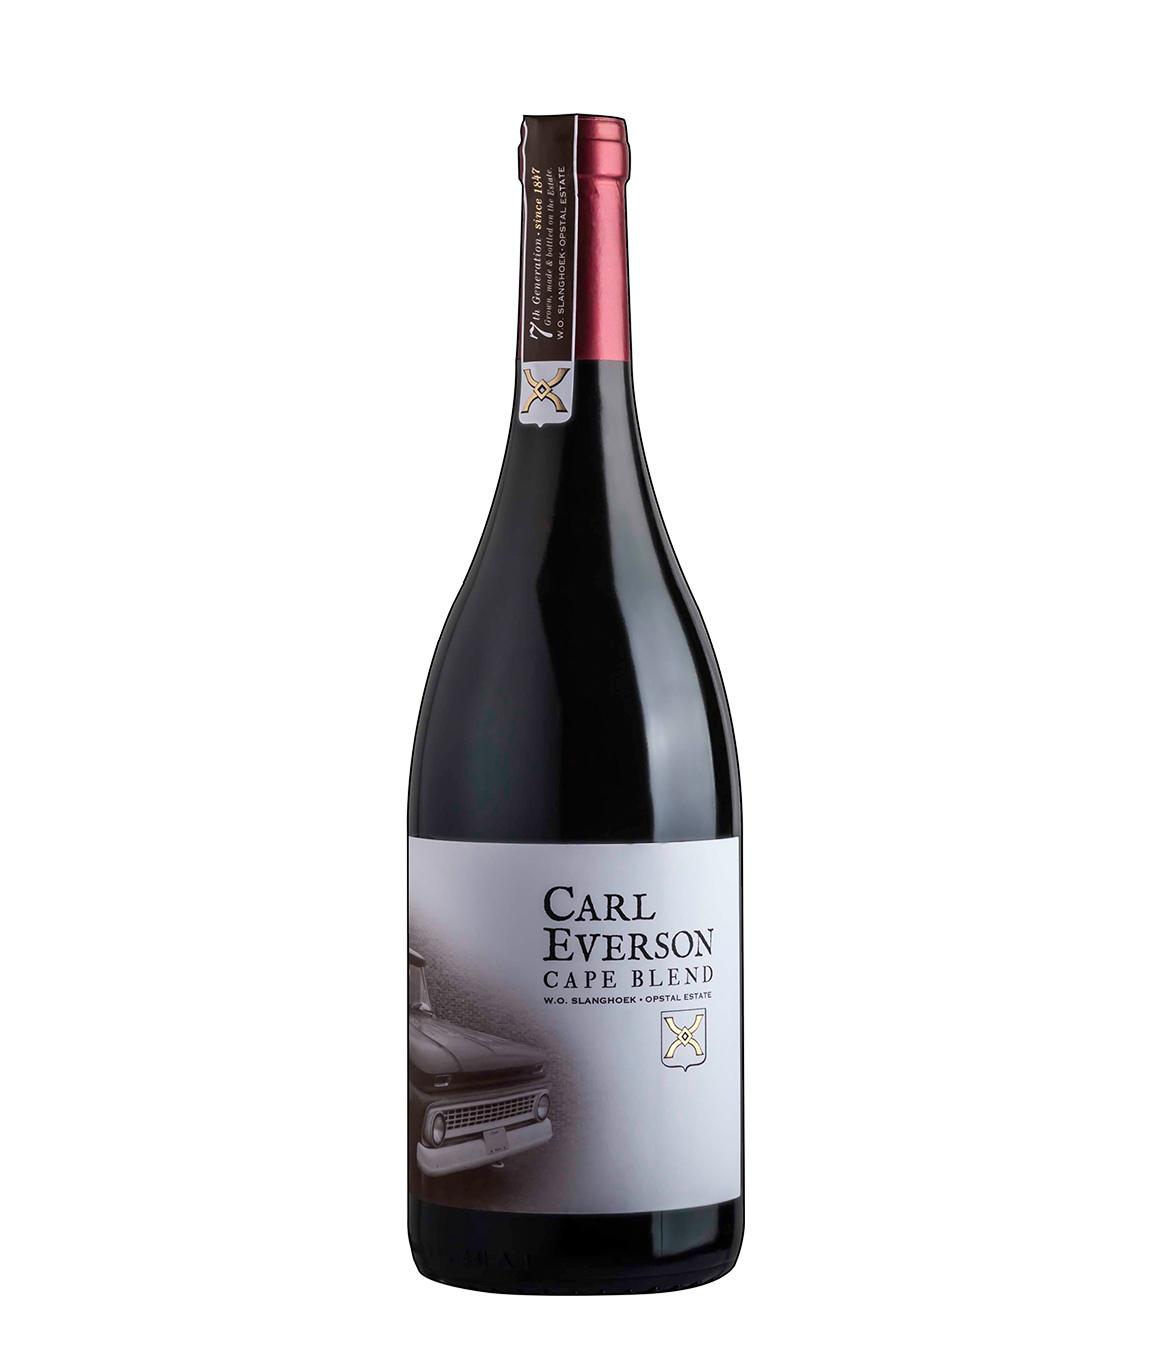 Carl-Everson-cape-blend-1150-x-1350.jpg